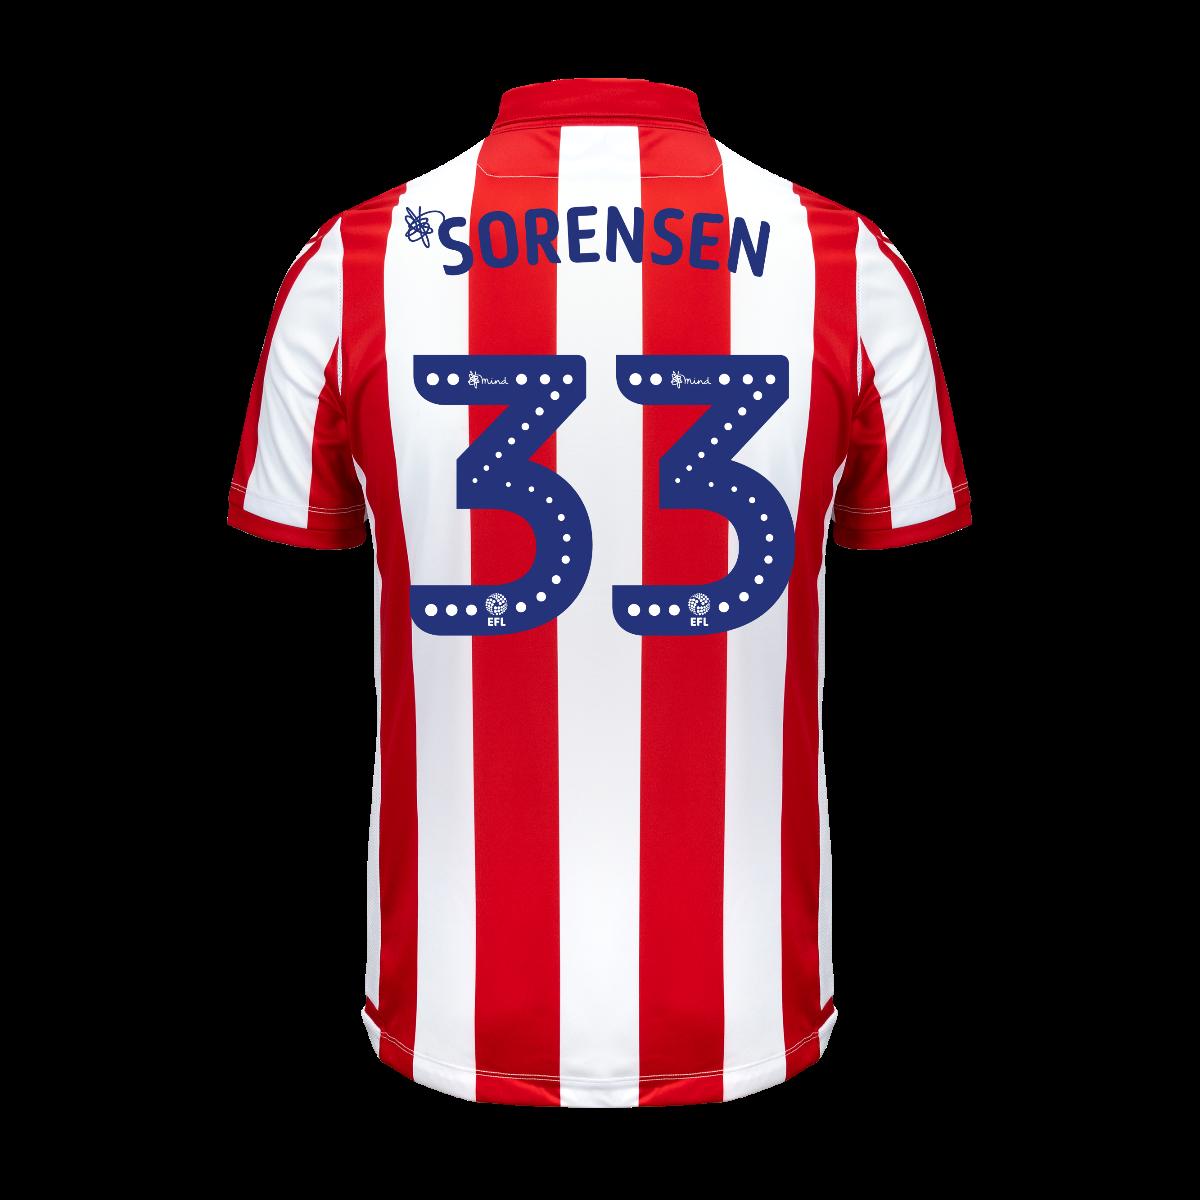 2019/20 Ladies Home Shirt - Sorensen